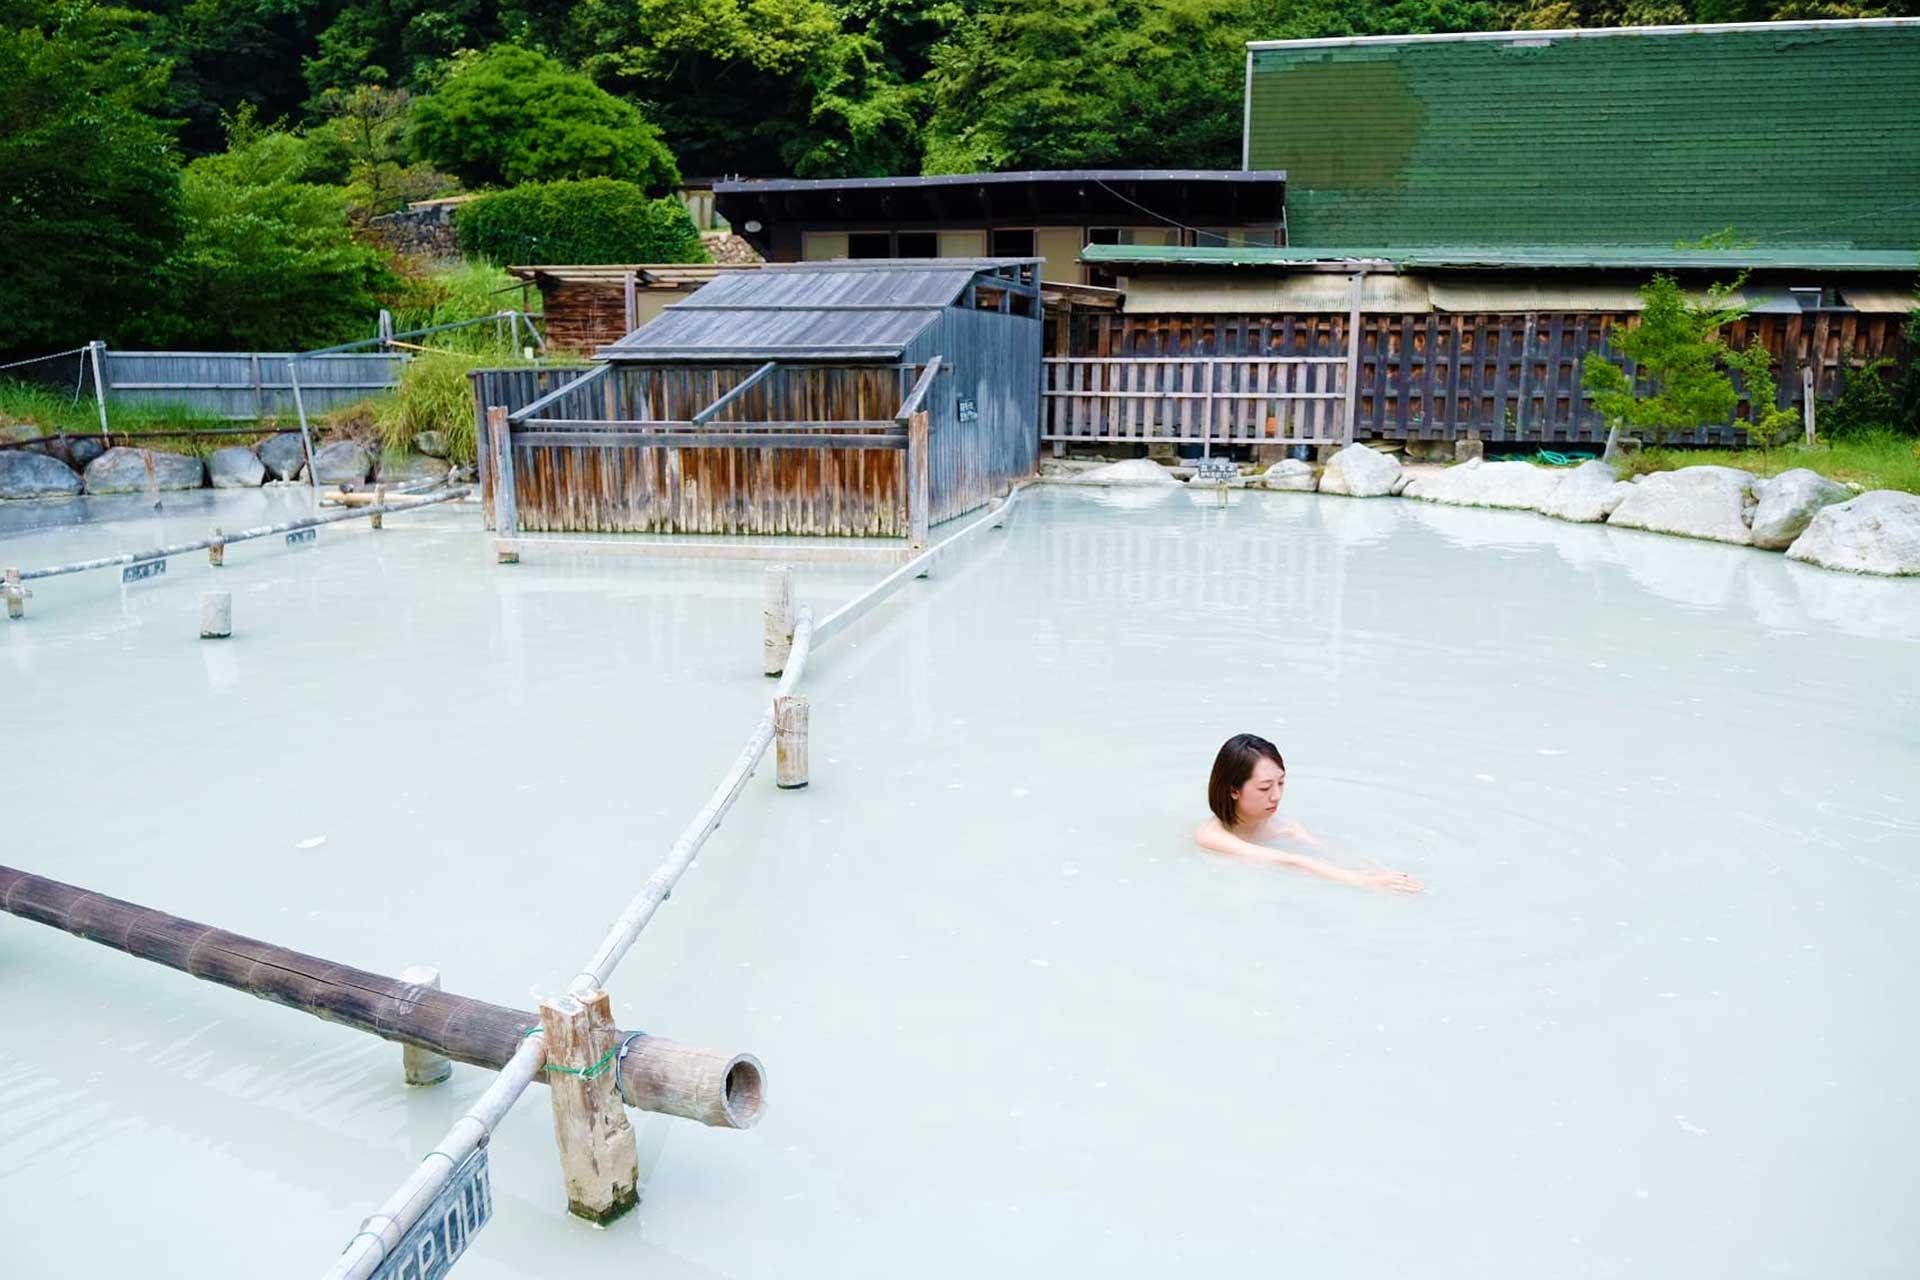 Beppu Outdoor Mud Bath, Japan Tours, RediscoverTours.com